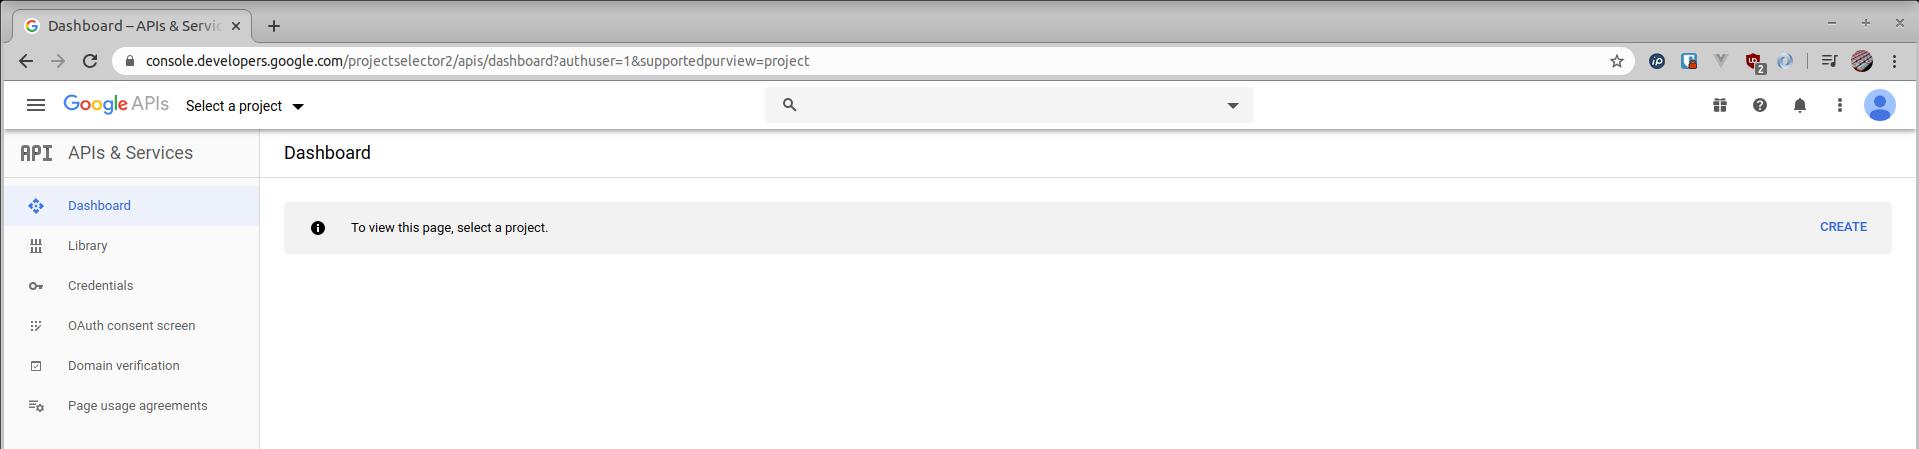 create new project google